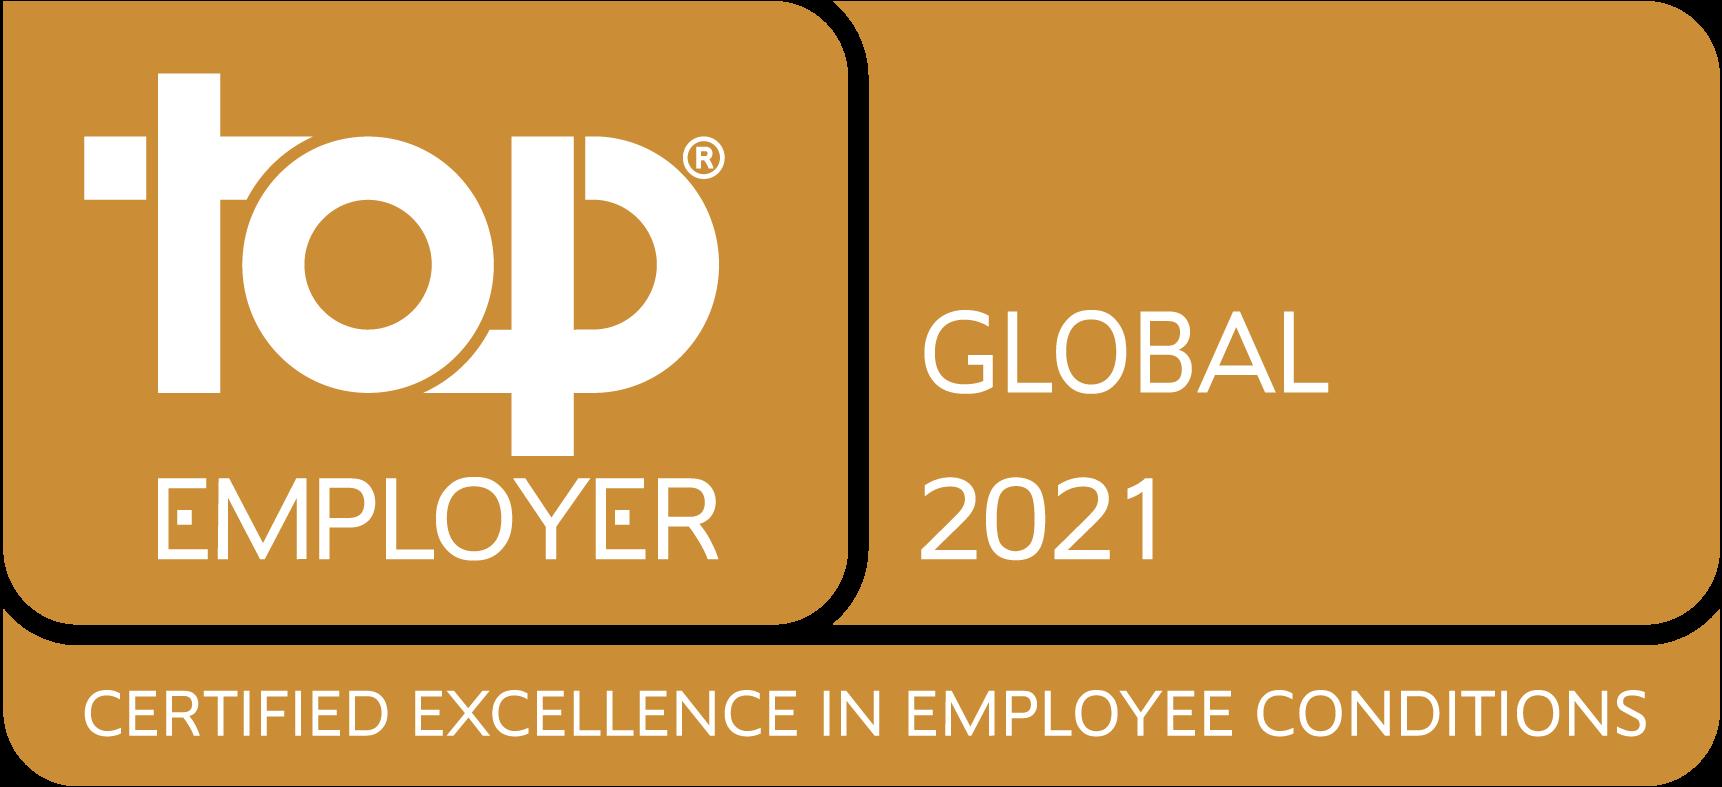 Foto de Top employer global 2021